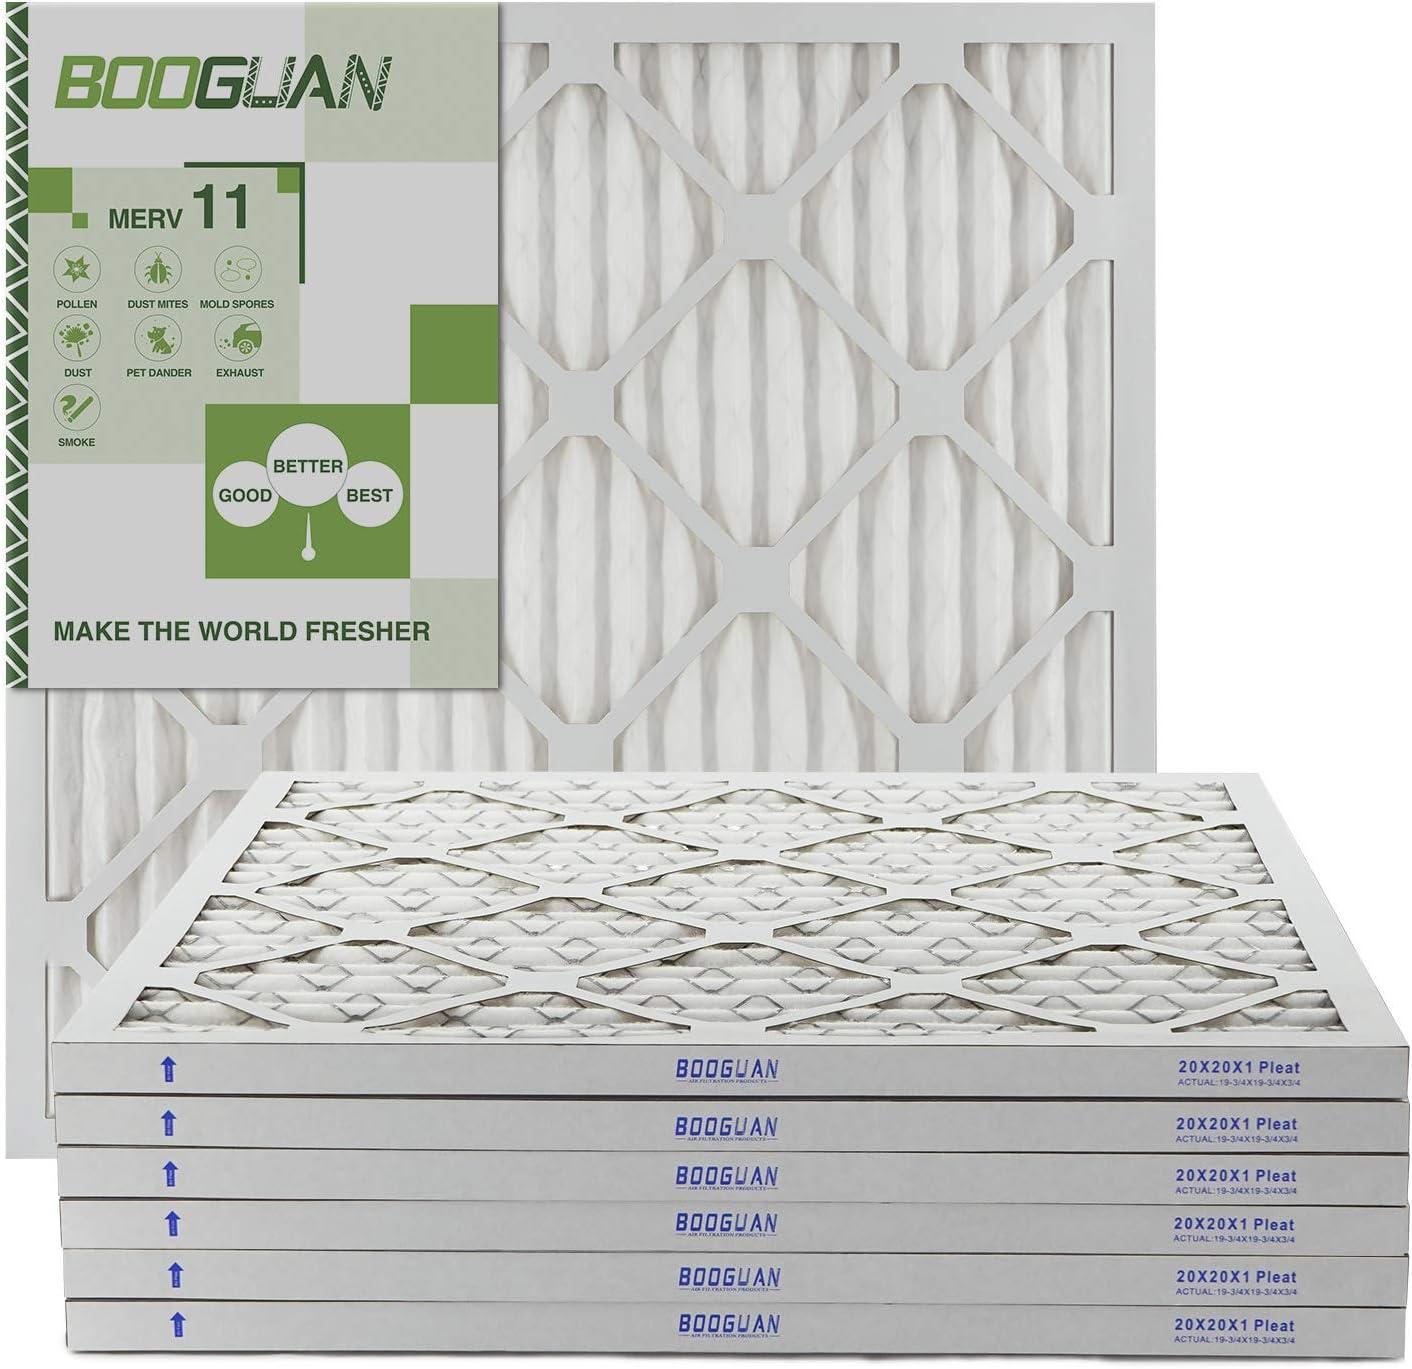 BOOGUAN 20x20x1 MERV11 Pleated HVAC HC Furnace Air Filter 6-Pack